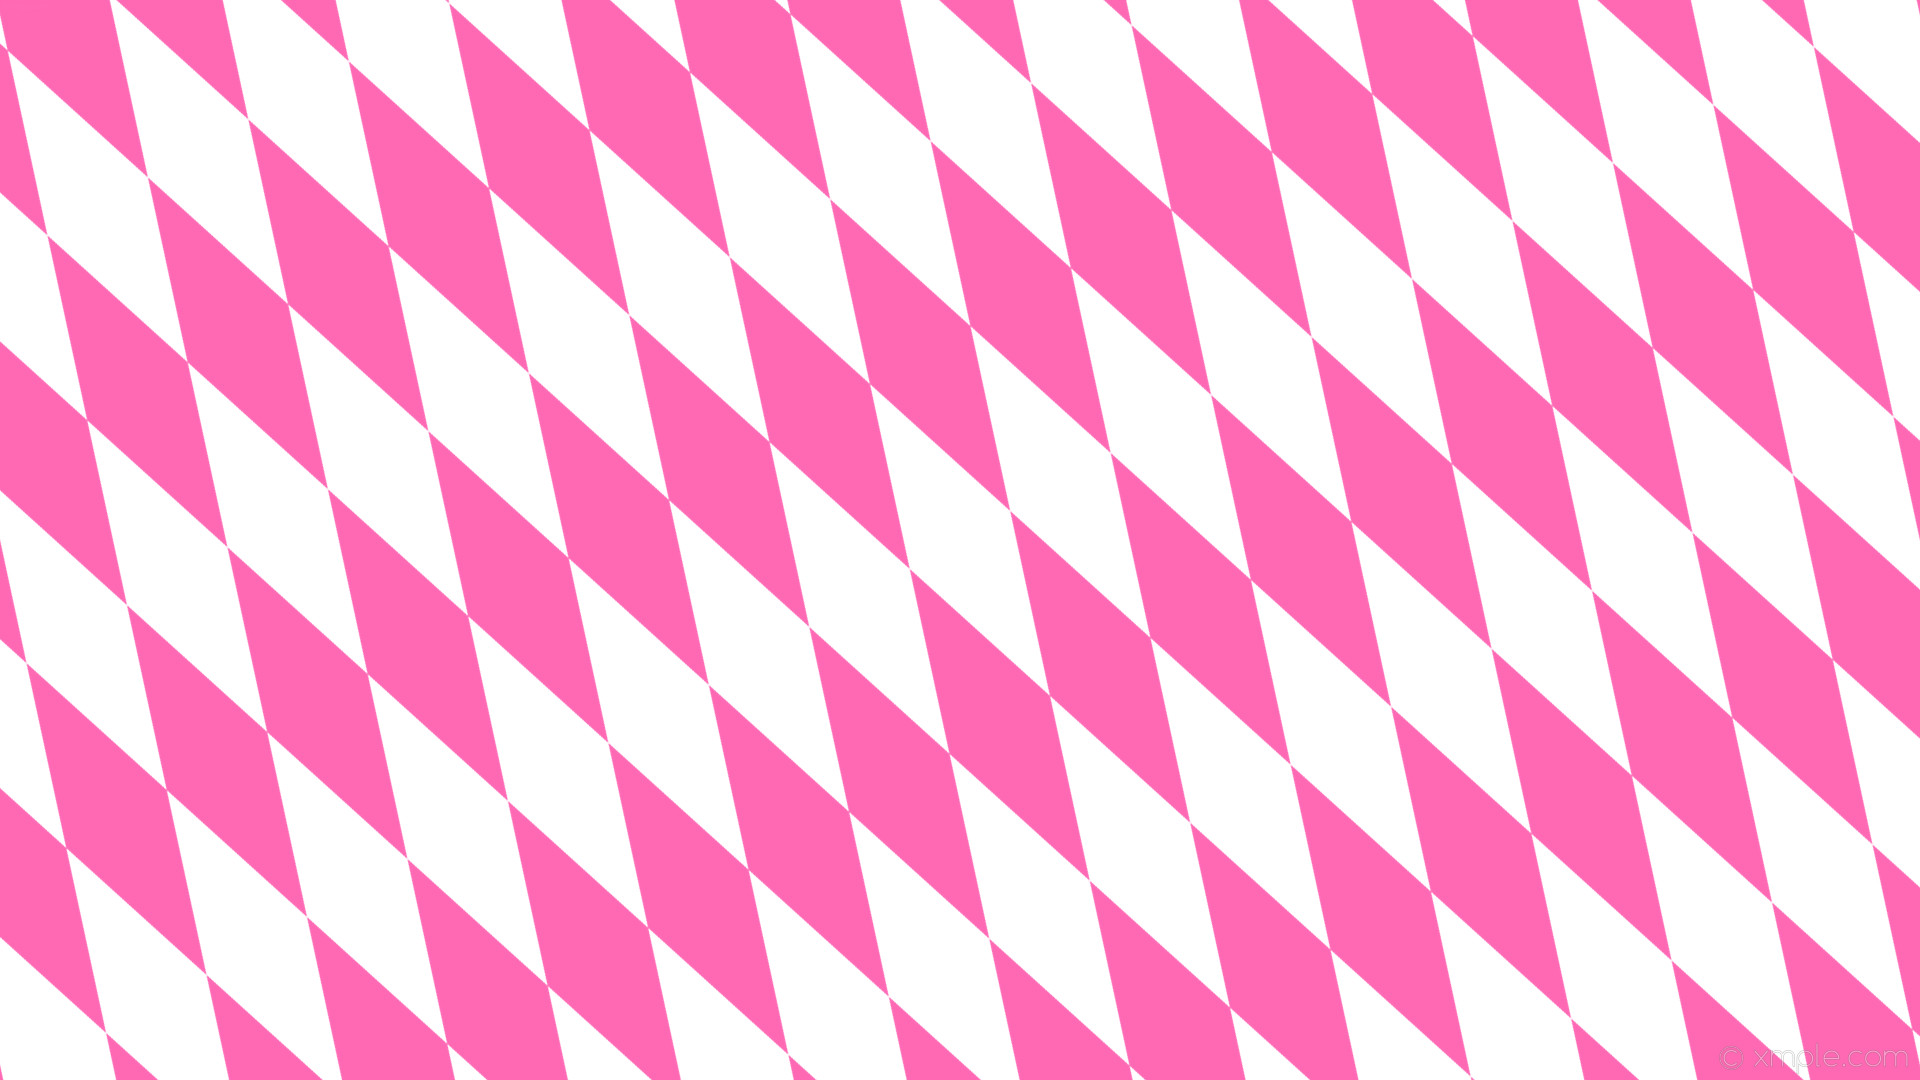 wallpaper rhombus pink diamond lozenge white hot pink #ffffff #ff69b4 120°  360px 116px